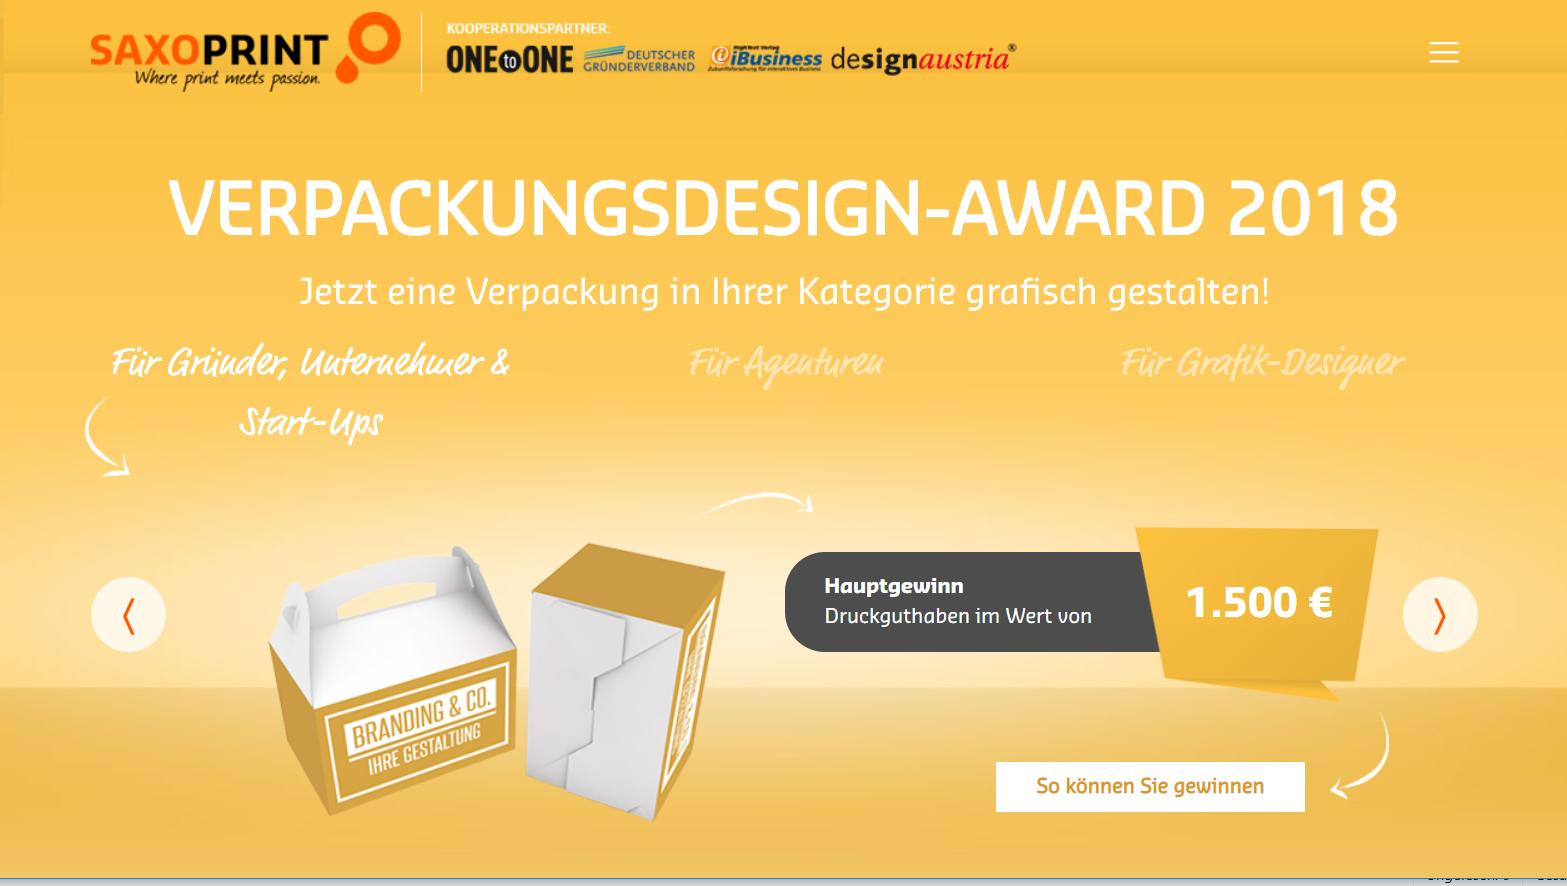 Verpackungsdesign-Award 2018